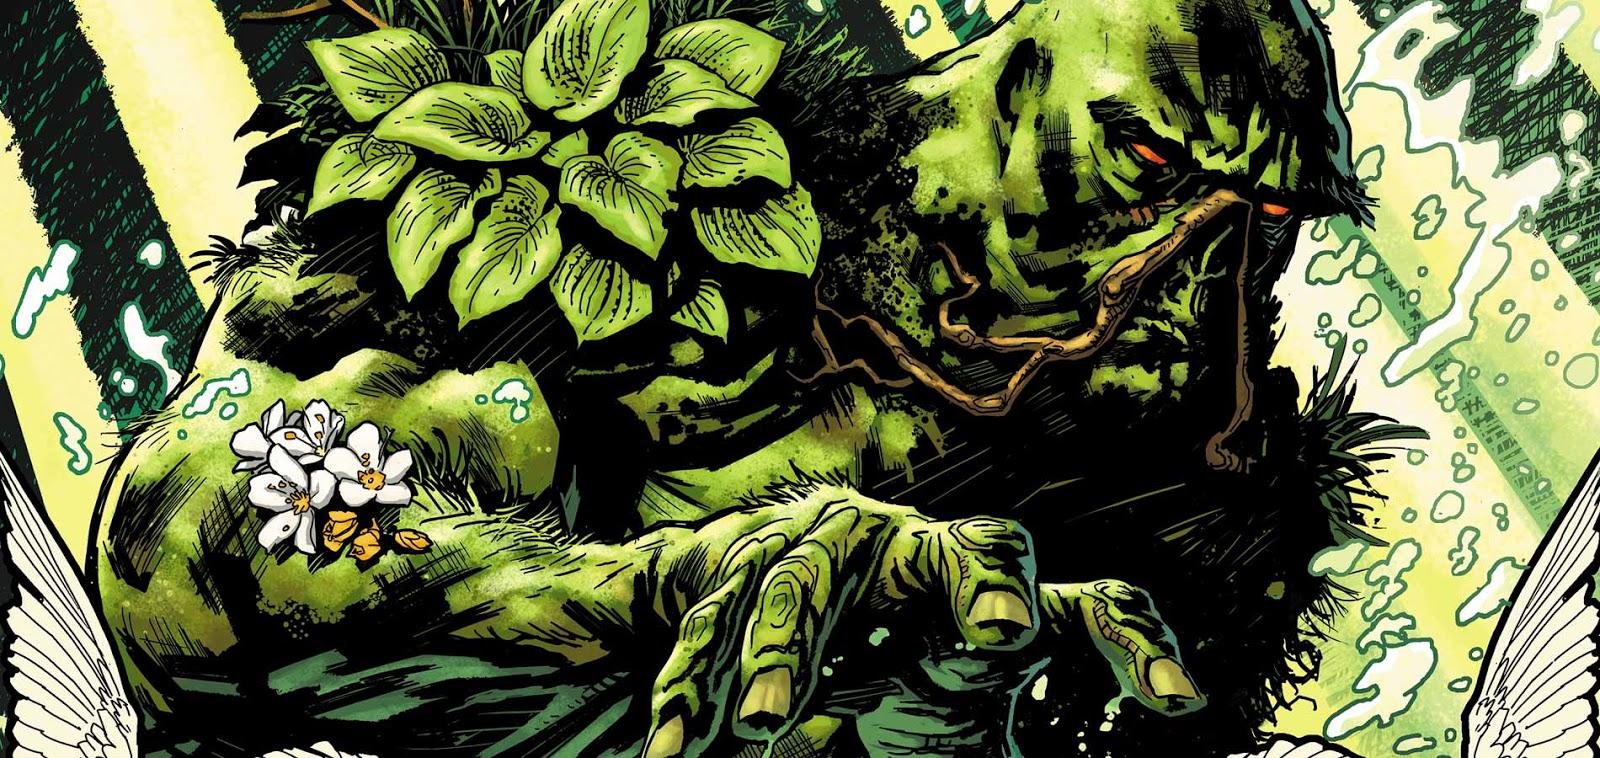 O Monstro do Pântano DC Comics